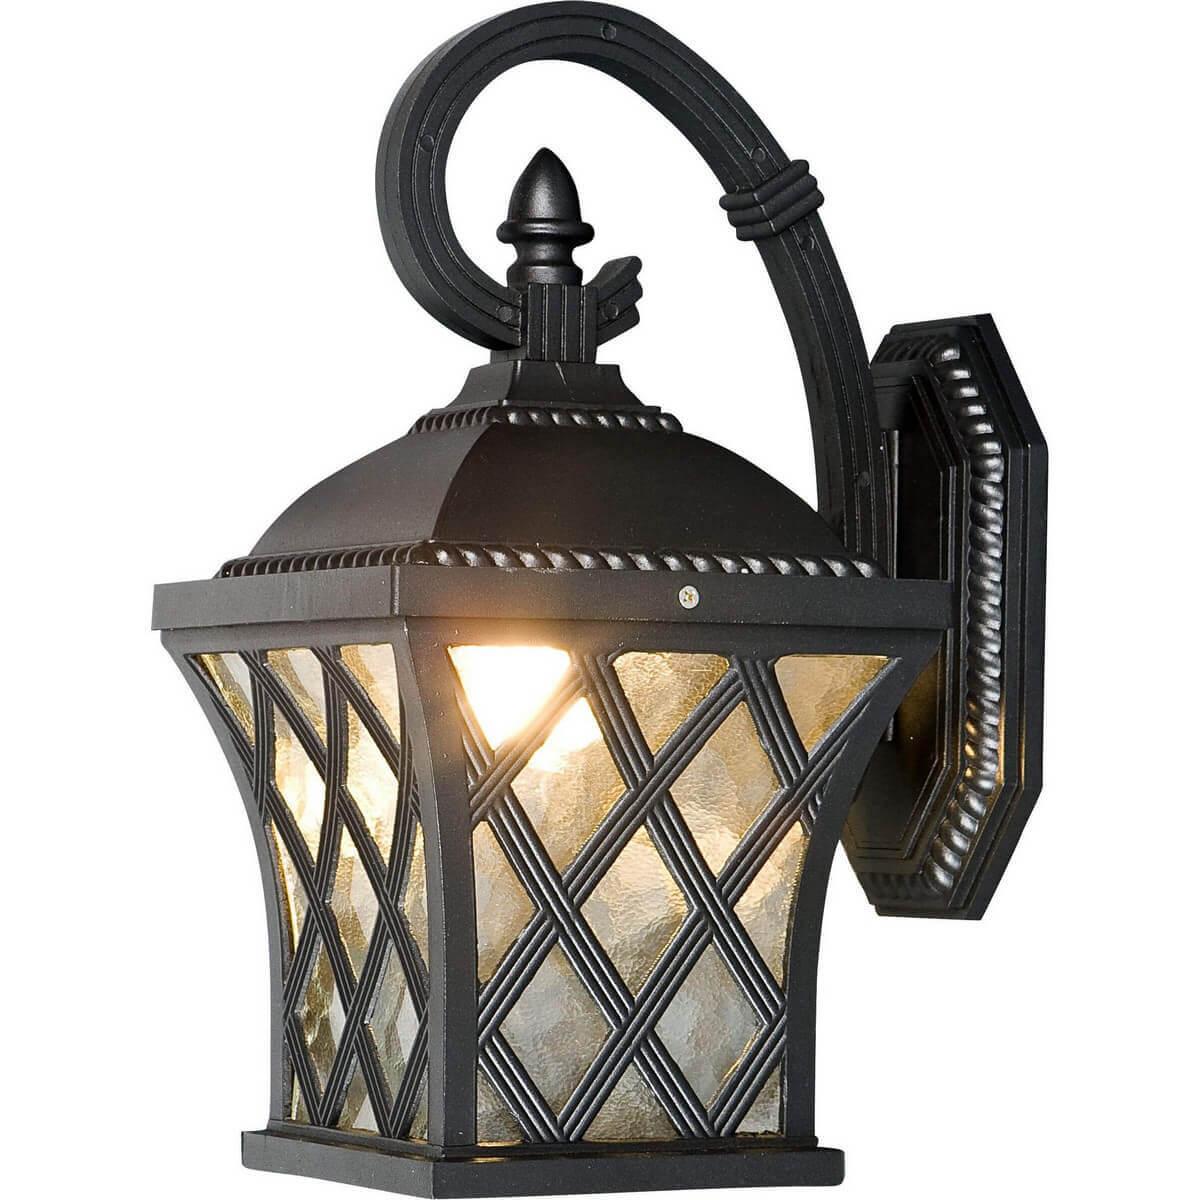 цены Уличный настенный светильник Nowodvorski Tay 5292